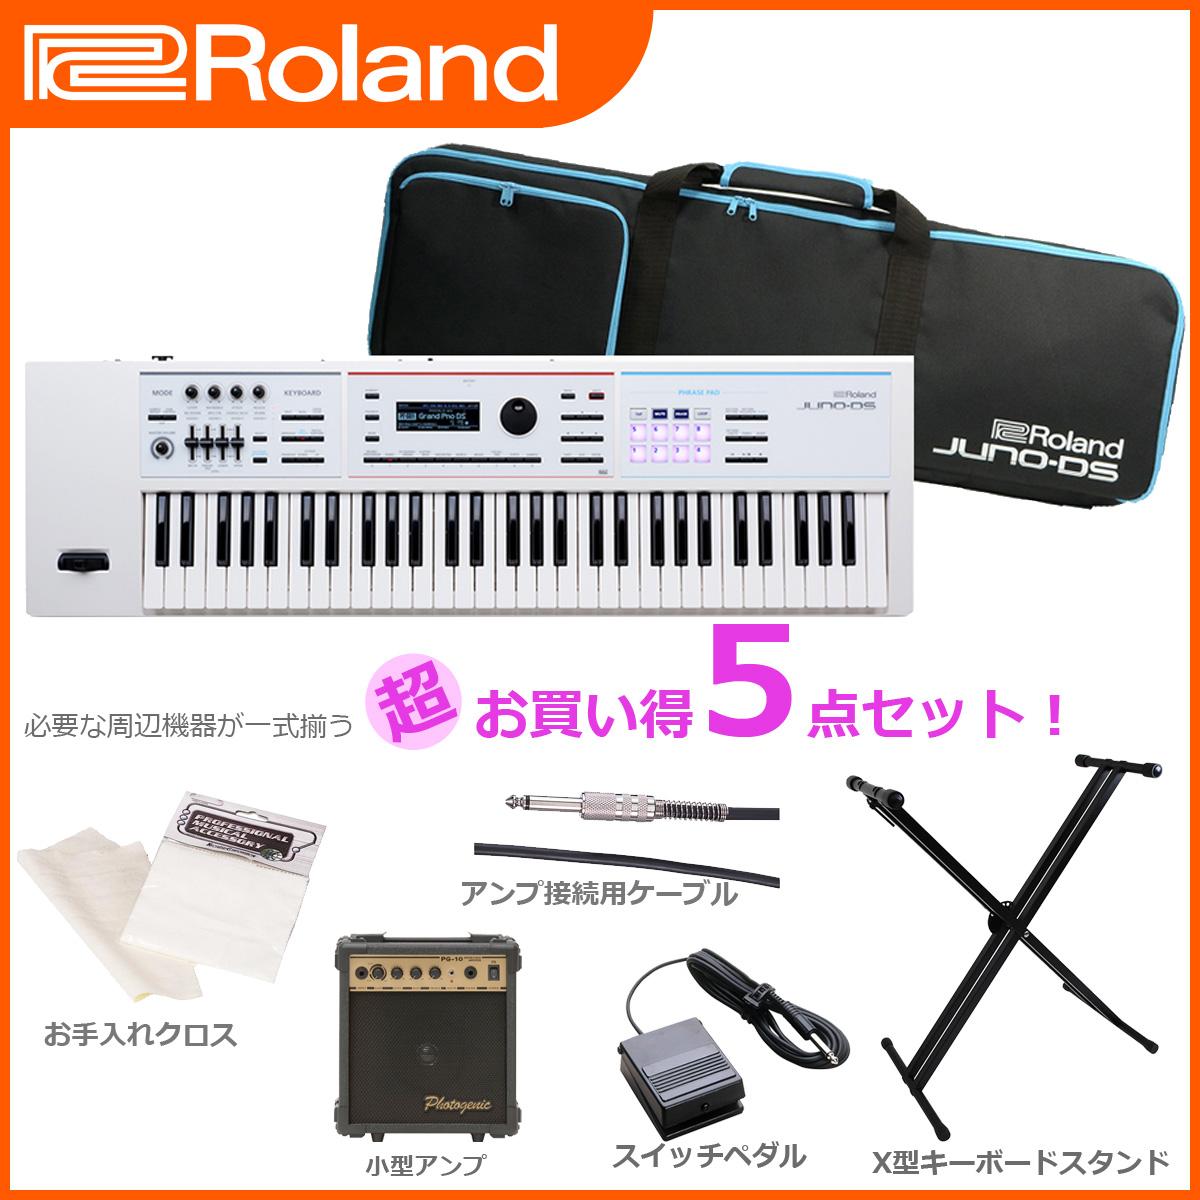 Roland ローランド / JUNO-DS61W 【豪華5点セット!】シンセサイザー ホワイトWH (JUNO-DS)【yrk】【YRK】